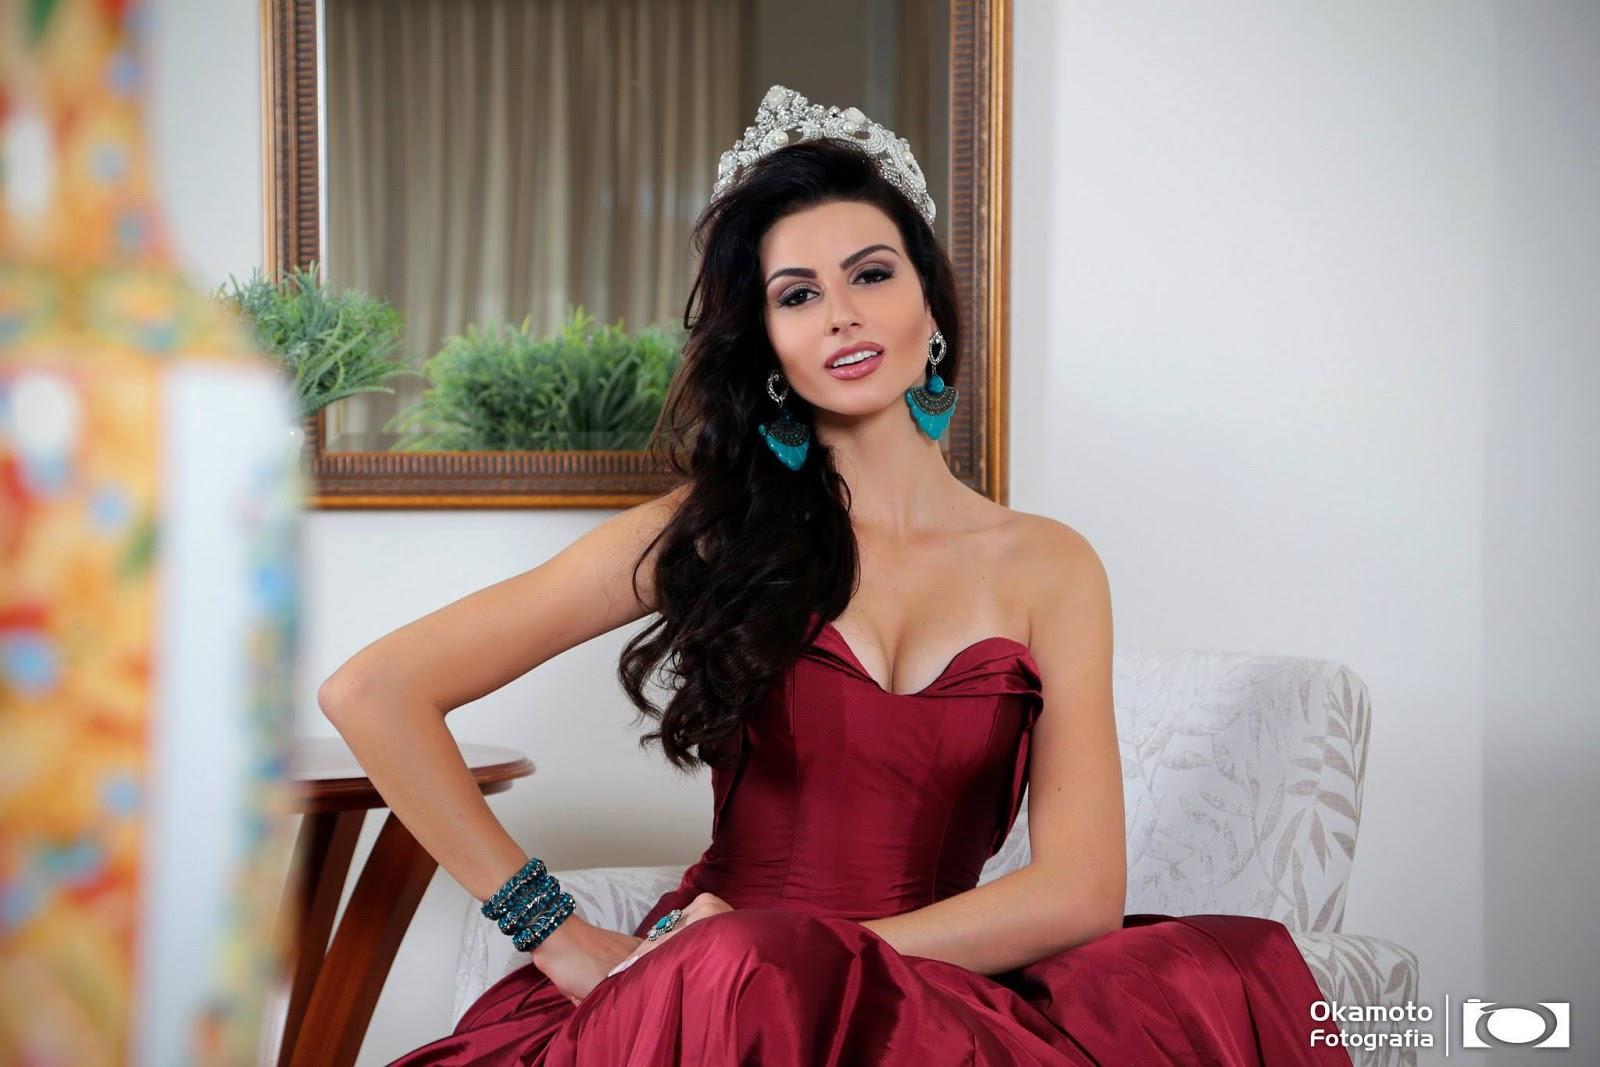 jessica vilela, miss sao paulo 2015. A6g3f4bw